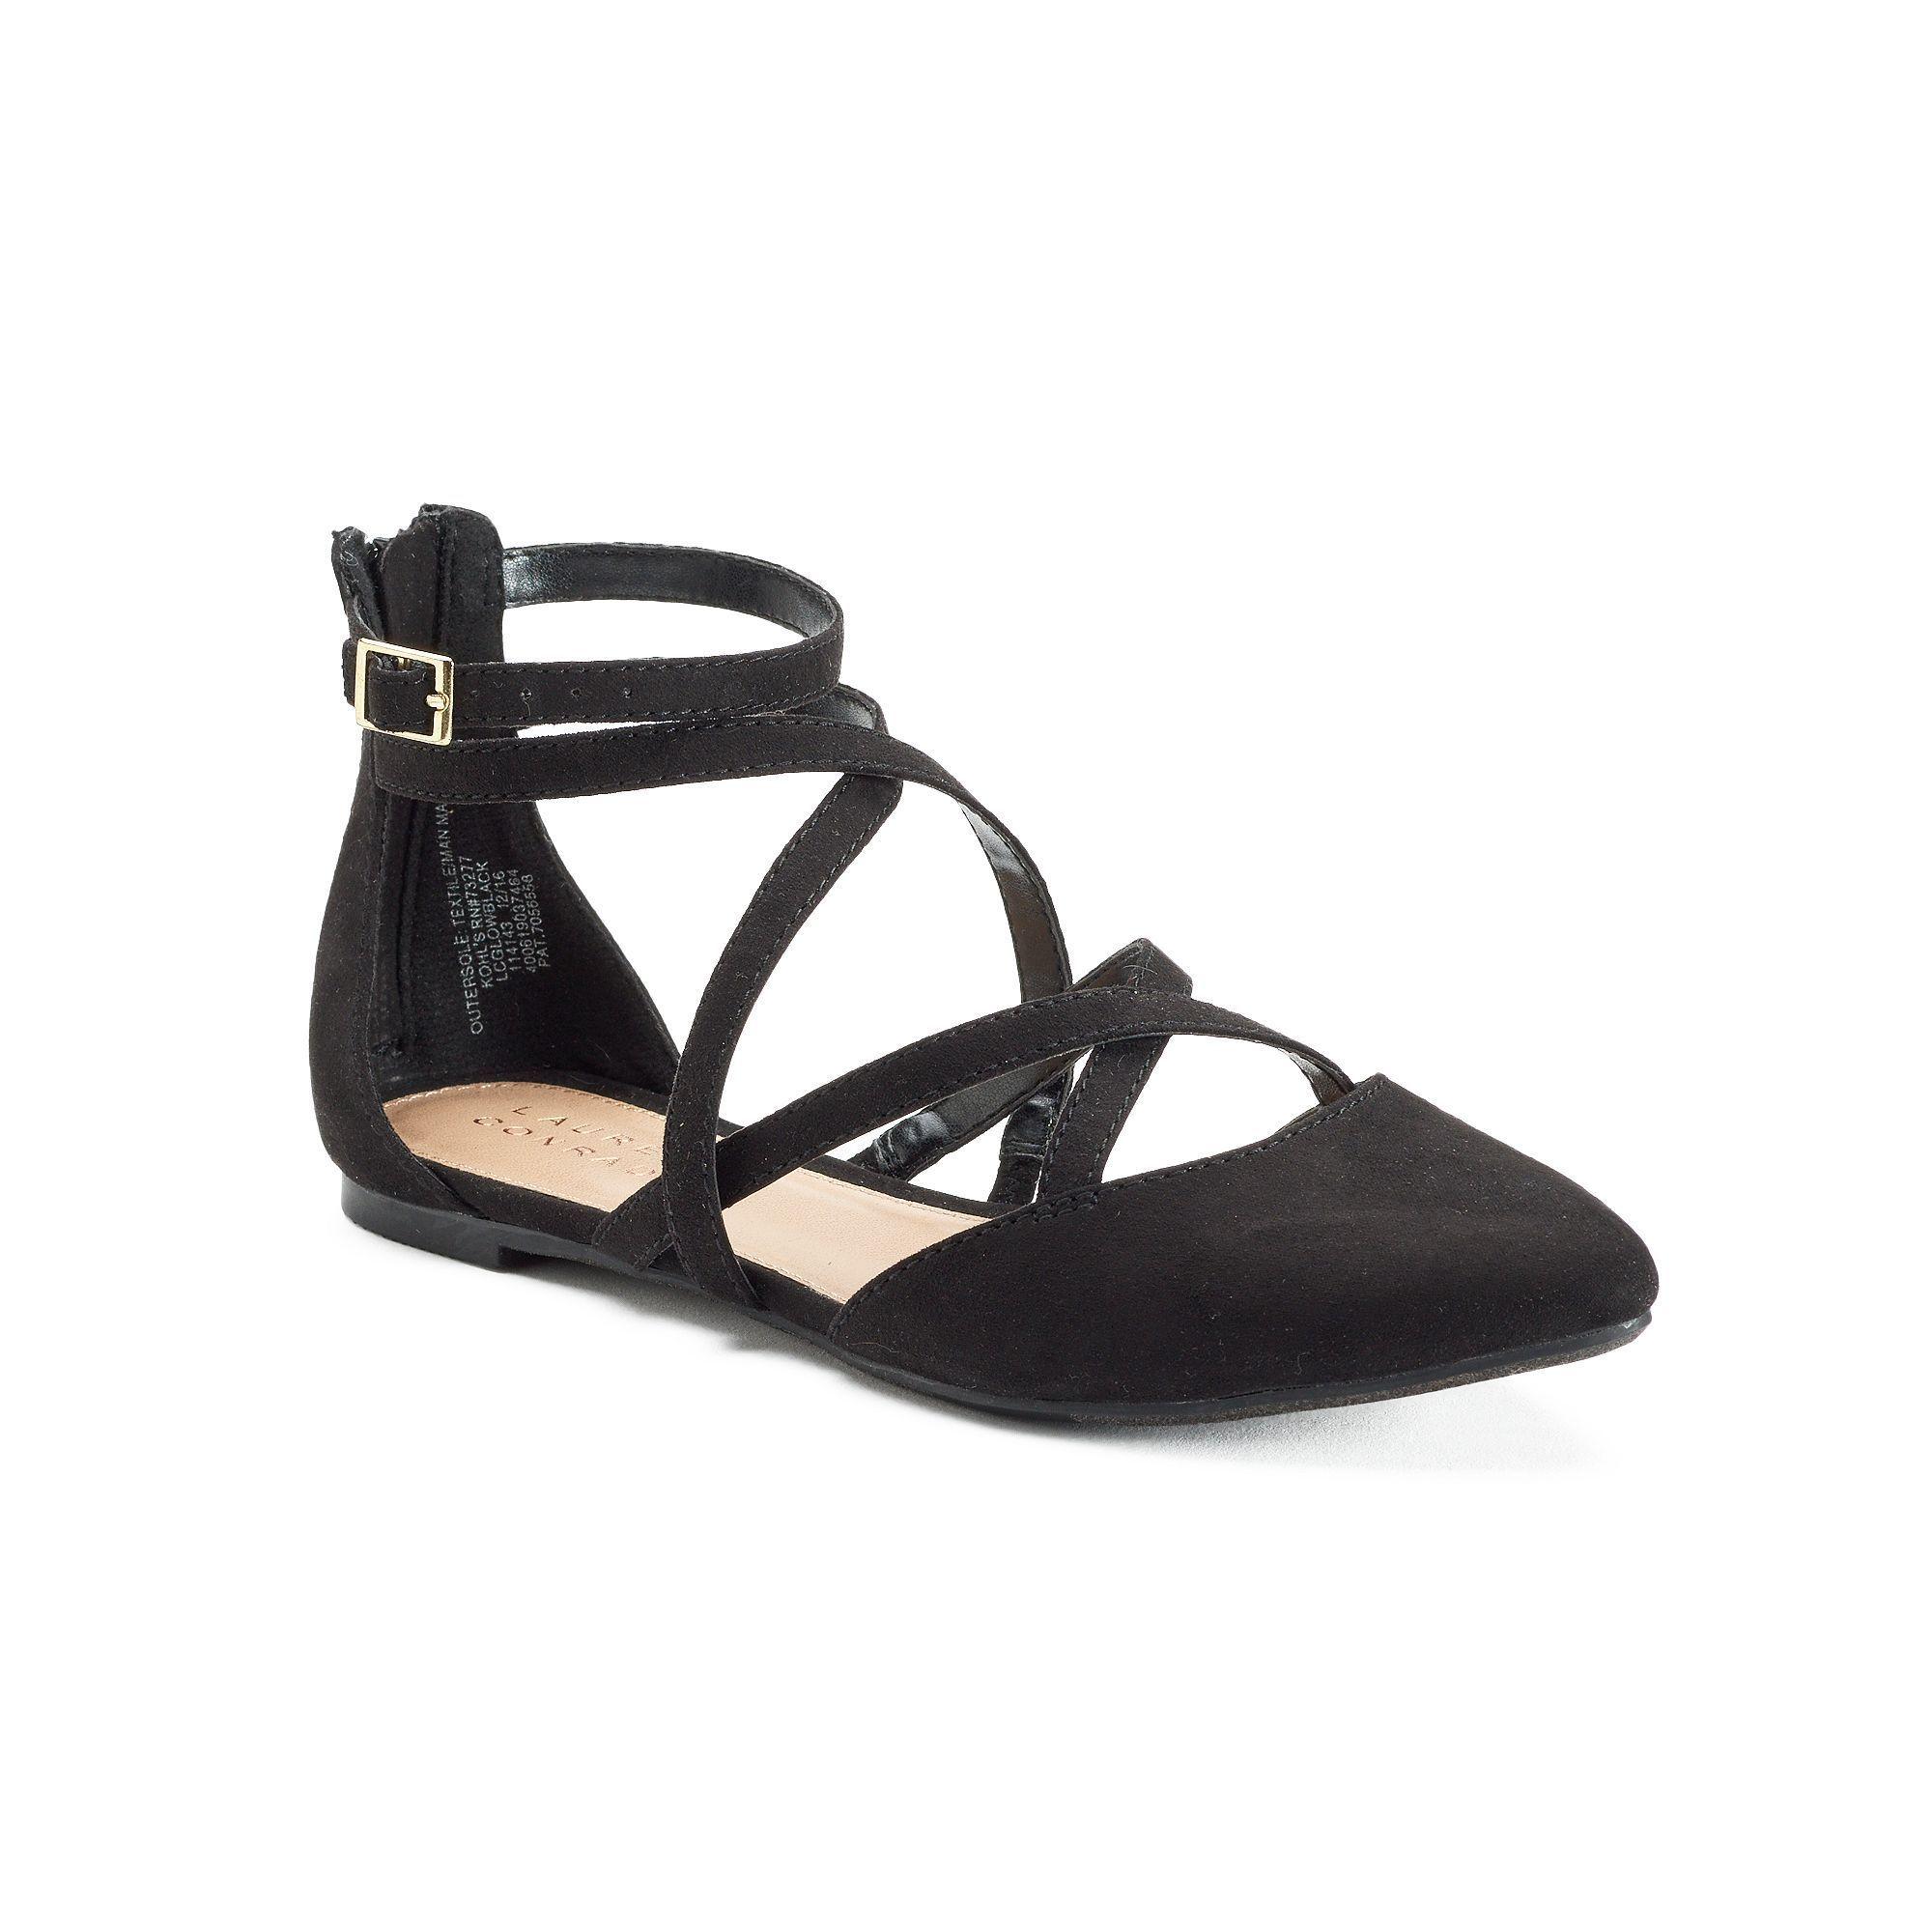 Women's LC LAUREN GLOW Black Strappy Zip up Flats Casual/Dress Shoes NEW